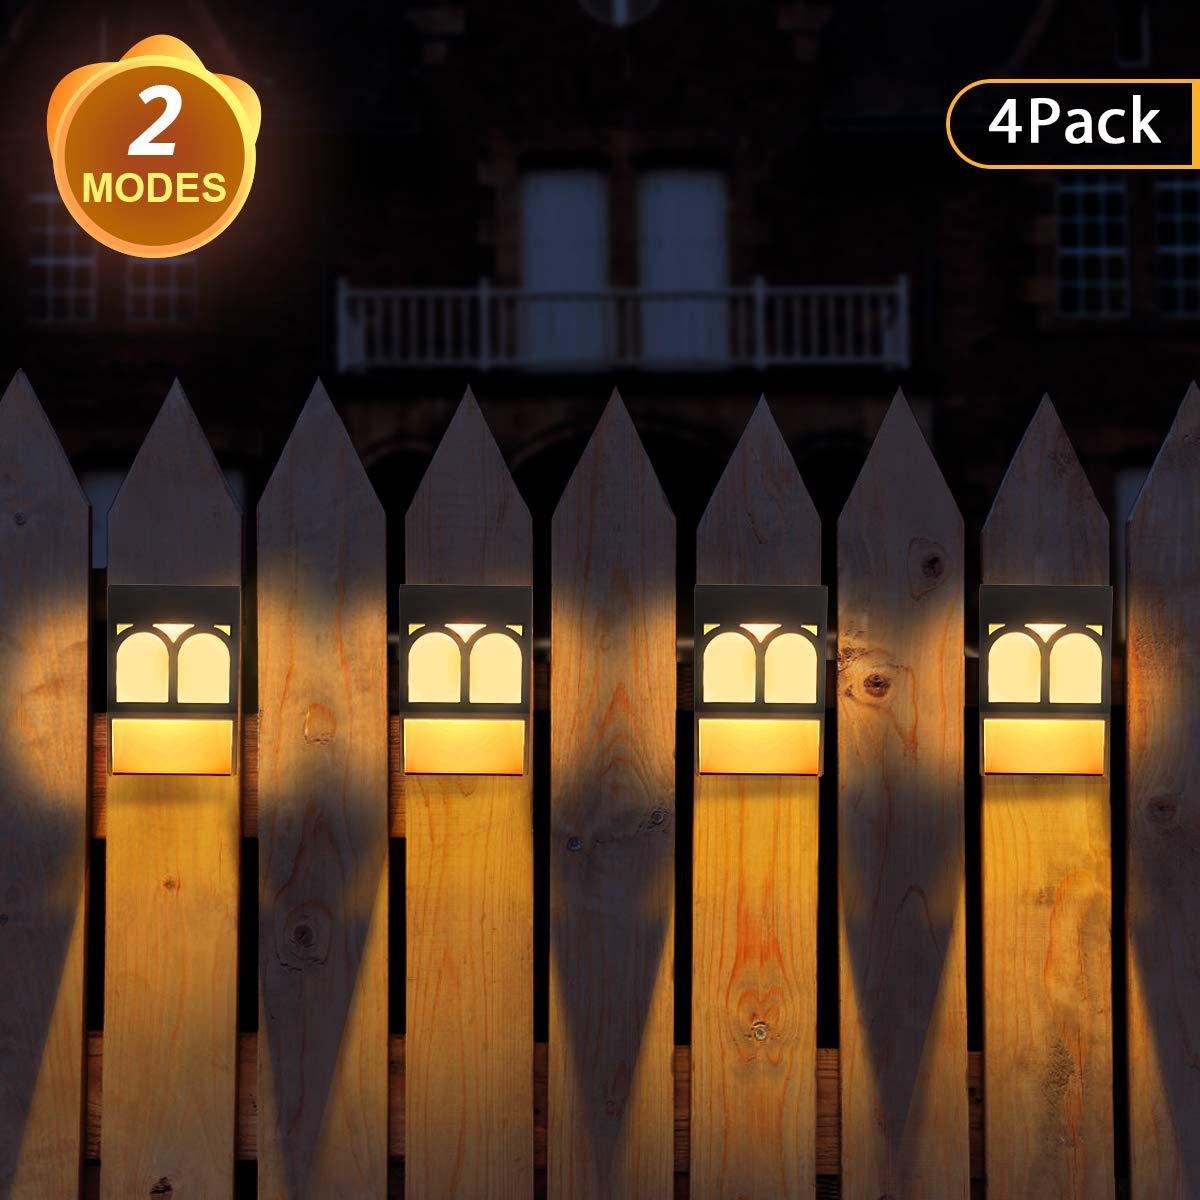 Front Door 4 Pack Stair Fence 2 Modes Solar Deck Lights for Garden Decorative Solar Lights Outdoor Patio